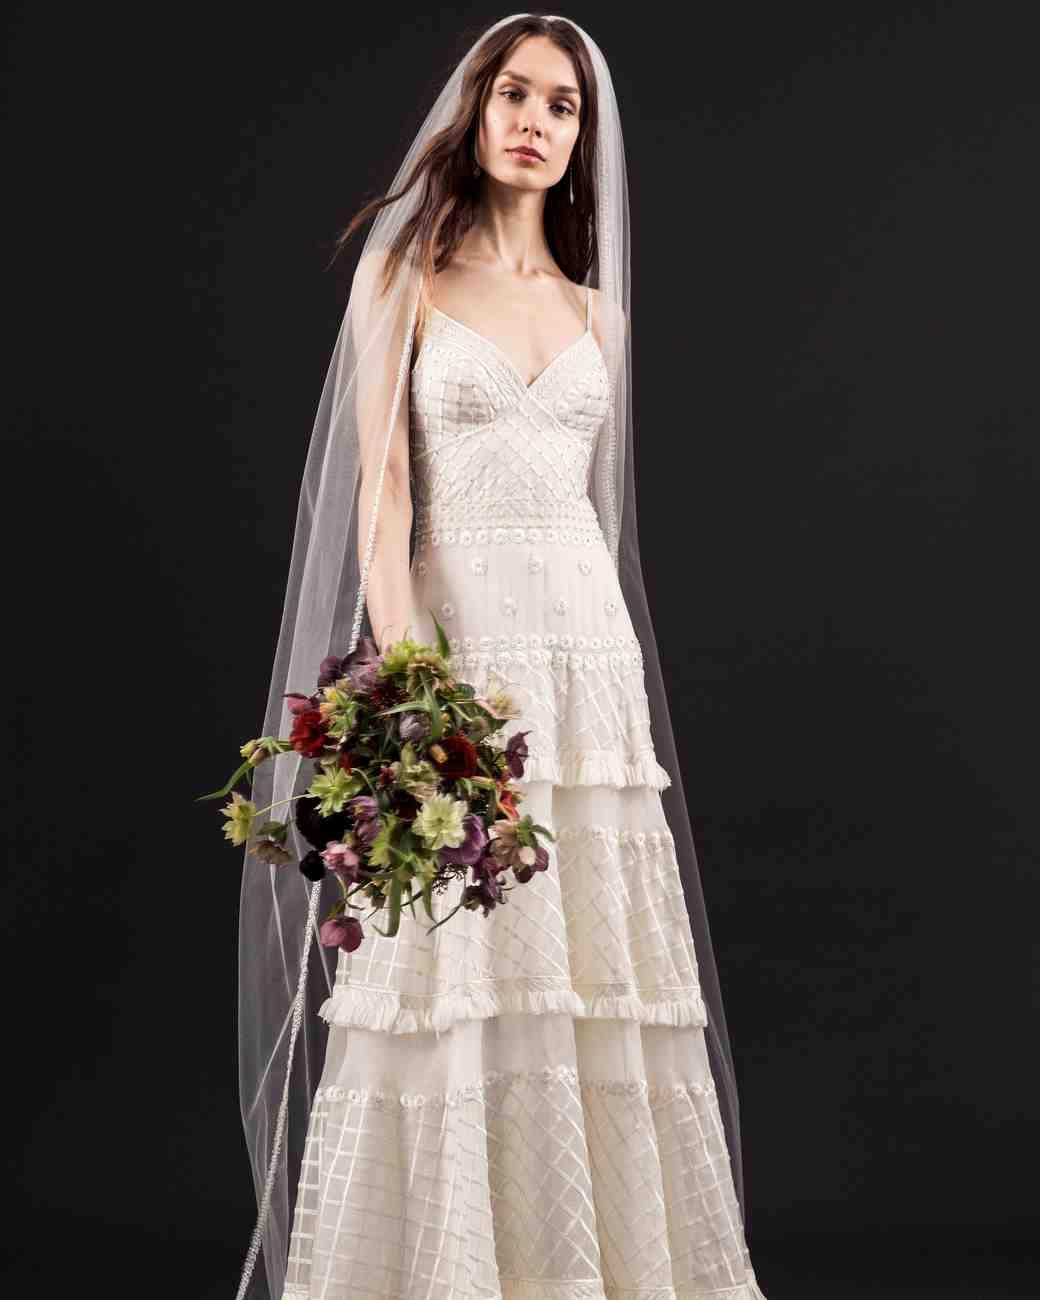 temperley-london-josephine-dress-bridal-market-ss17-0416.jpg